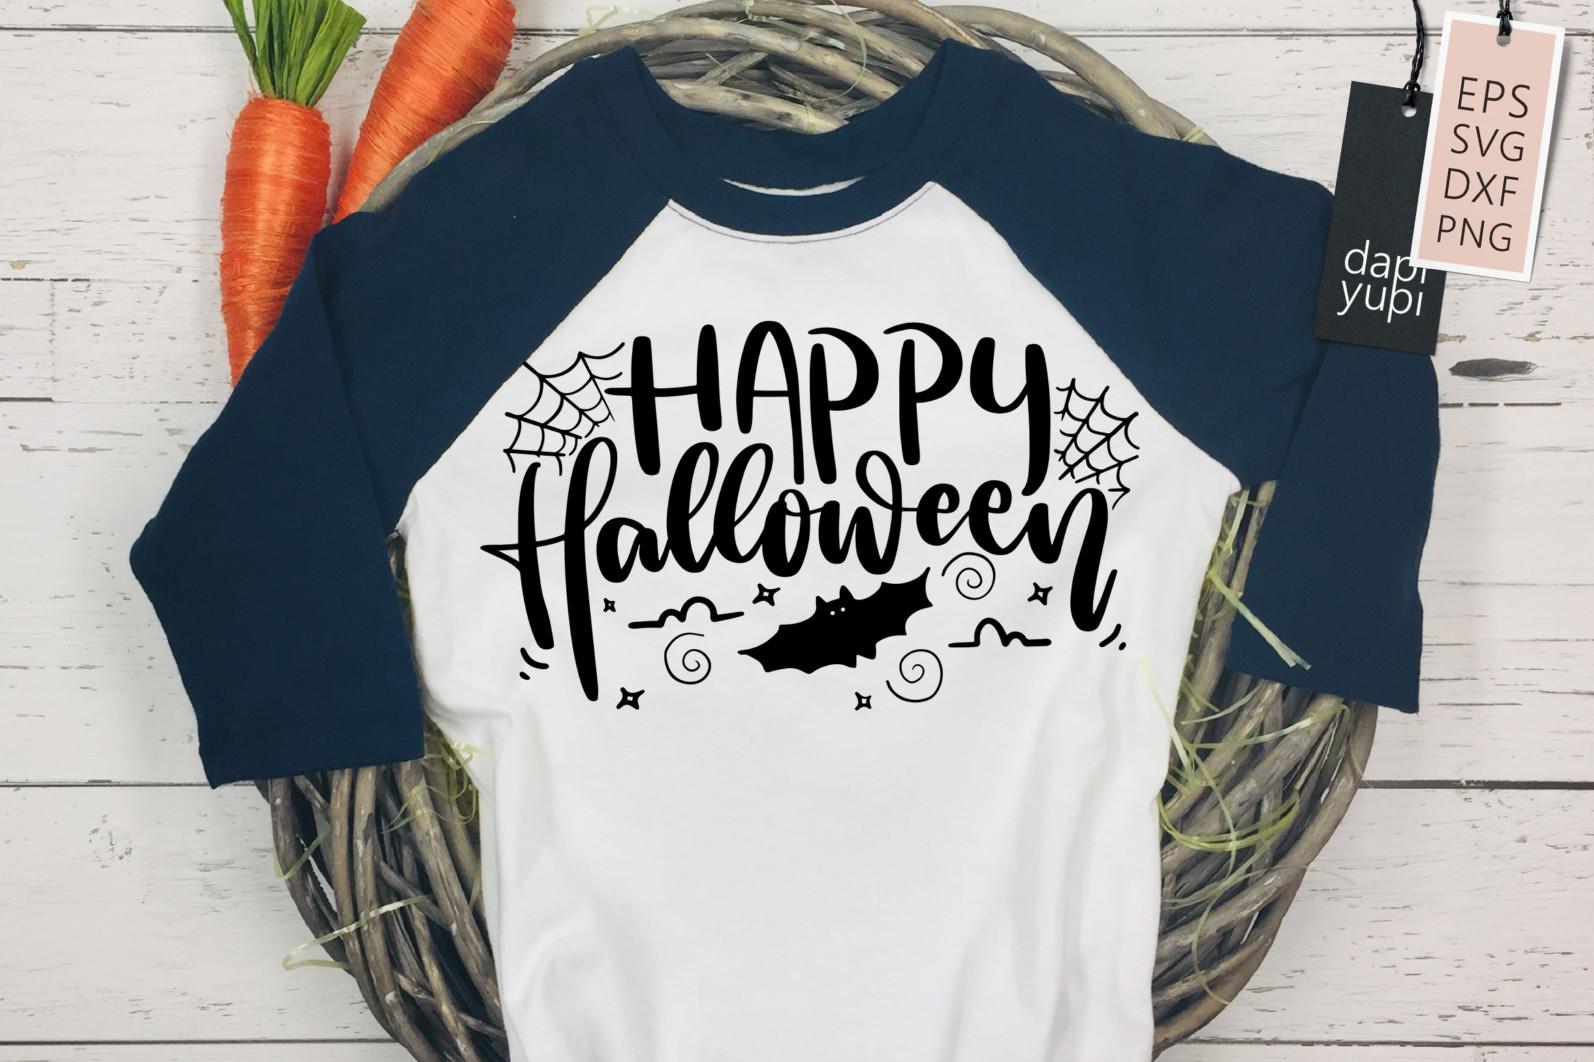 Halloween Quotes SVG Bundle Funny kids Halloween shirt decal SVG - halloween6 -